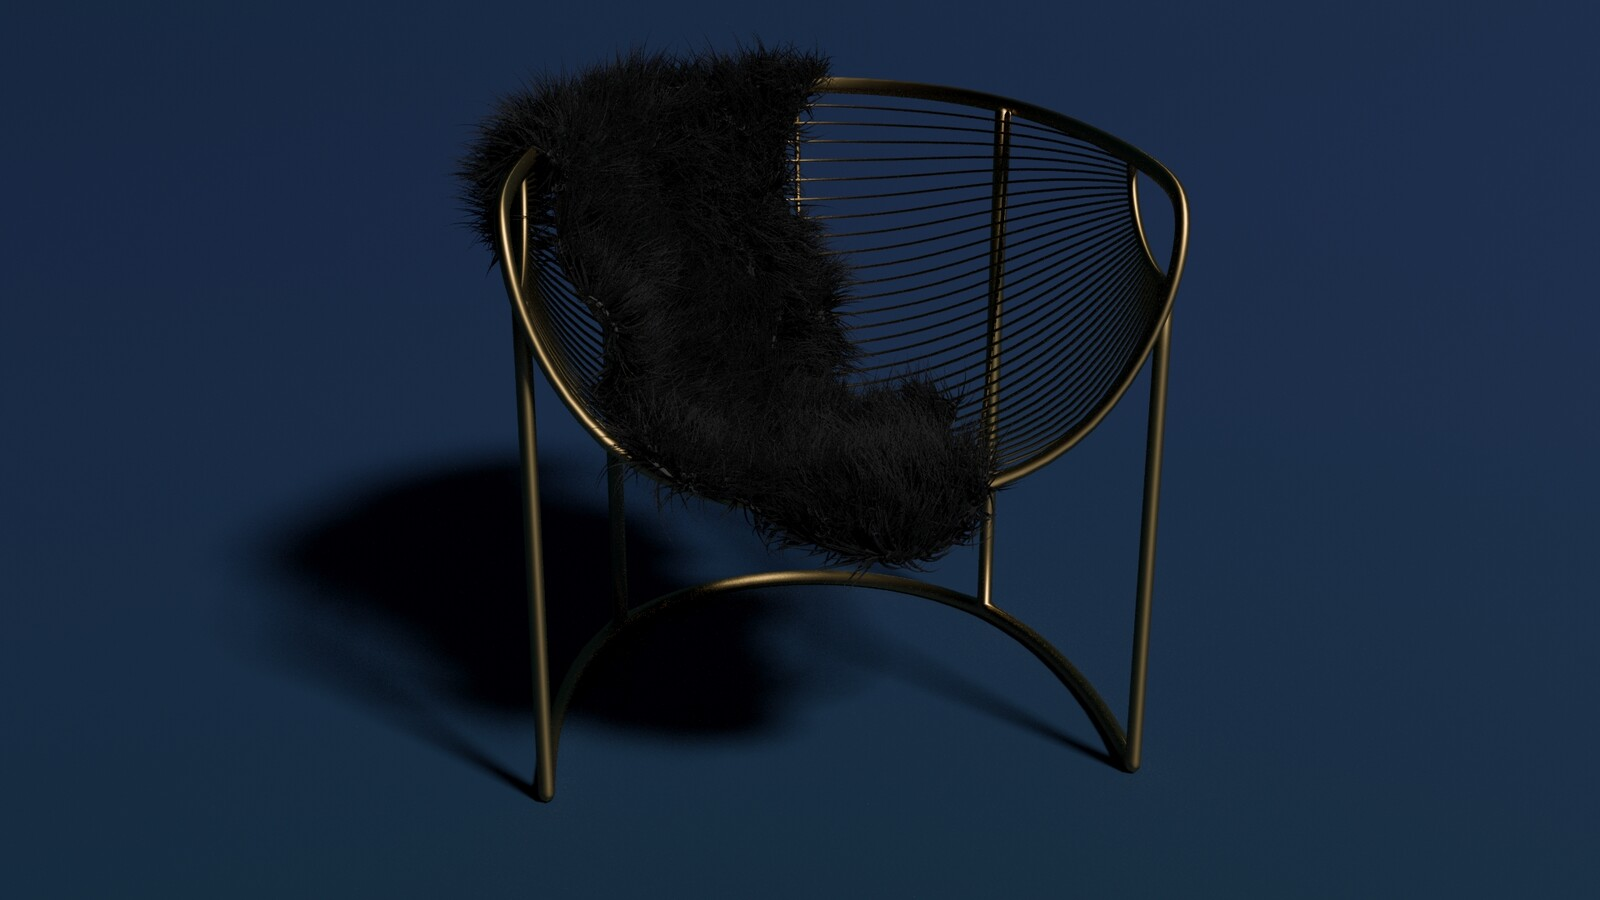 Blue Background/Black Fur Throw